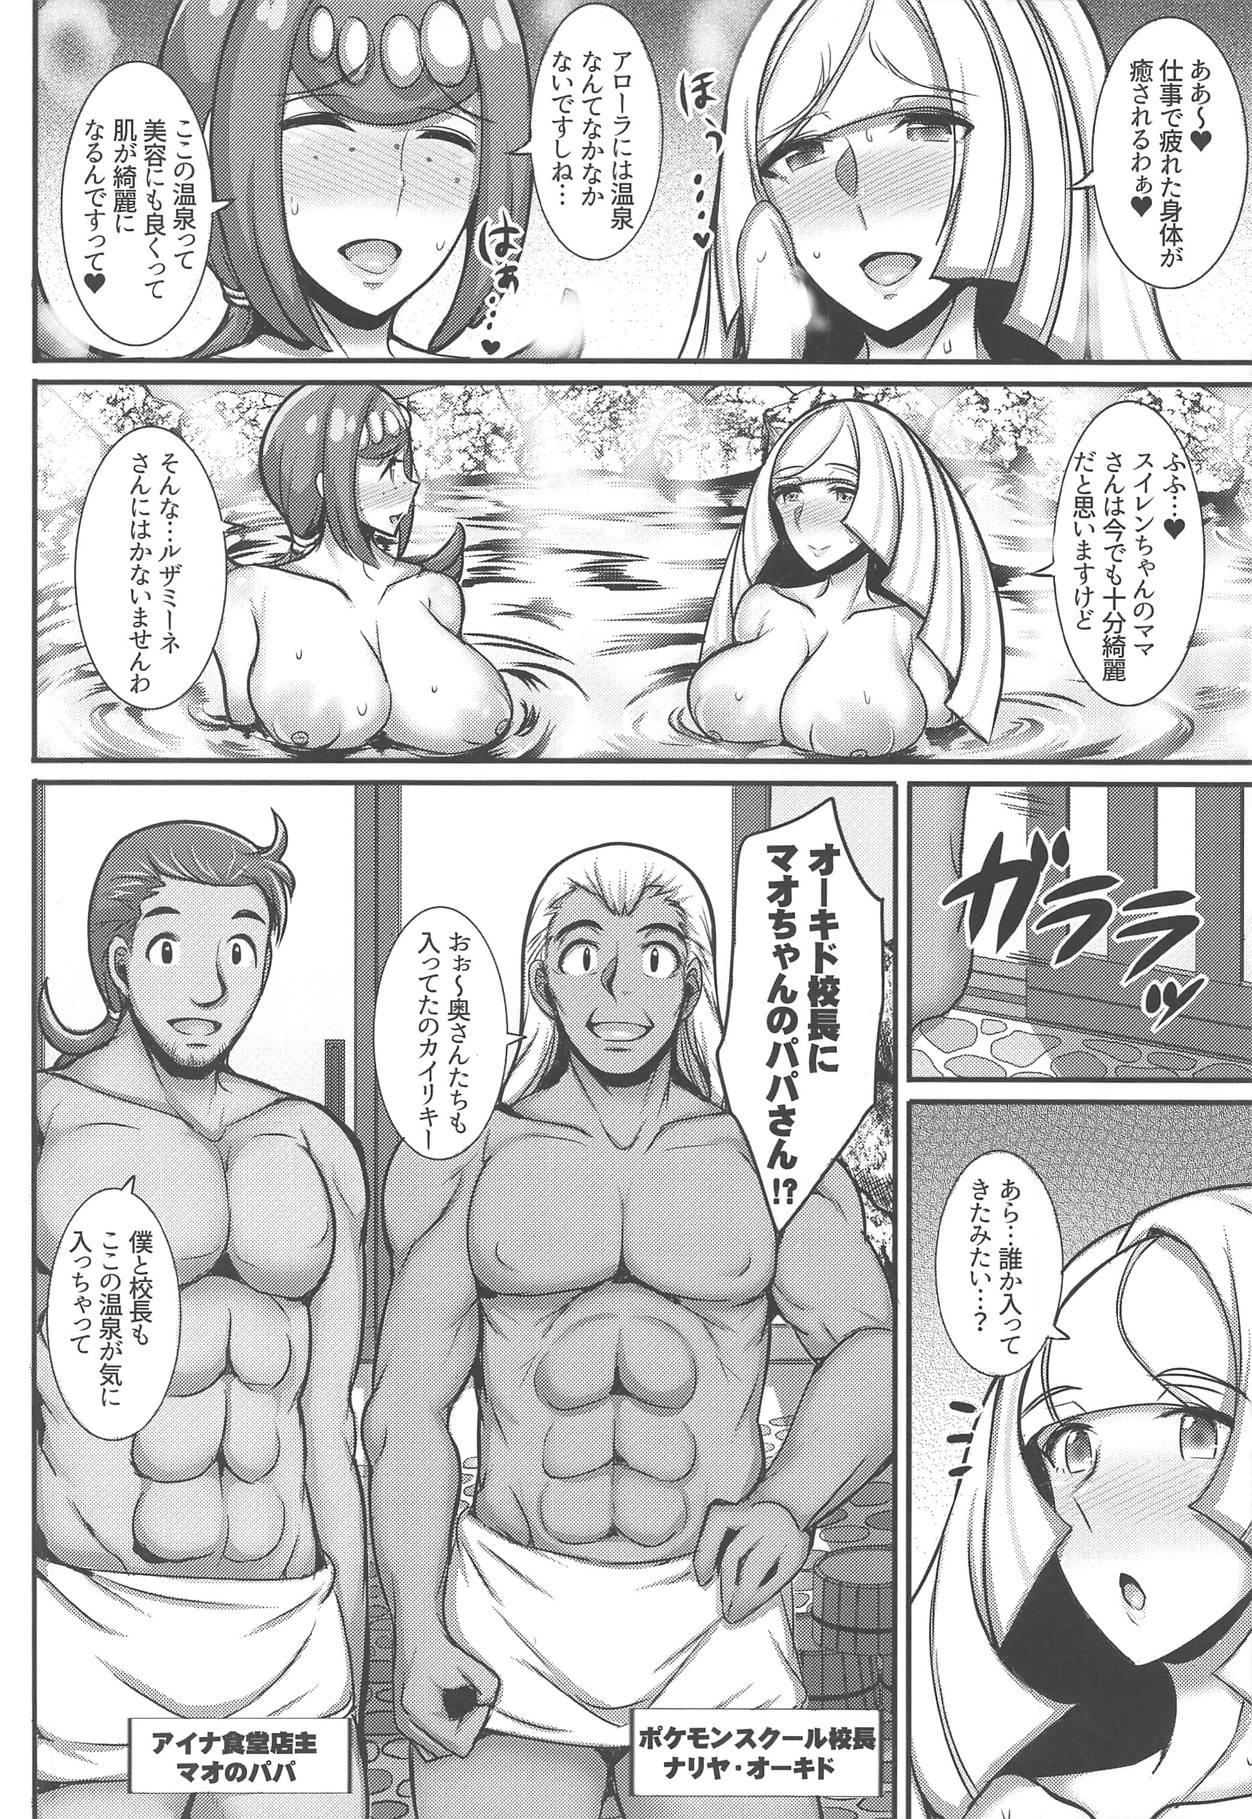 Alola Hitozuma Furin Onsen Ryokou 2